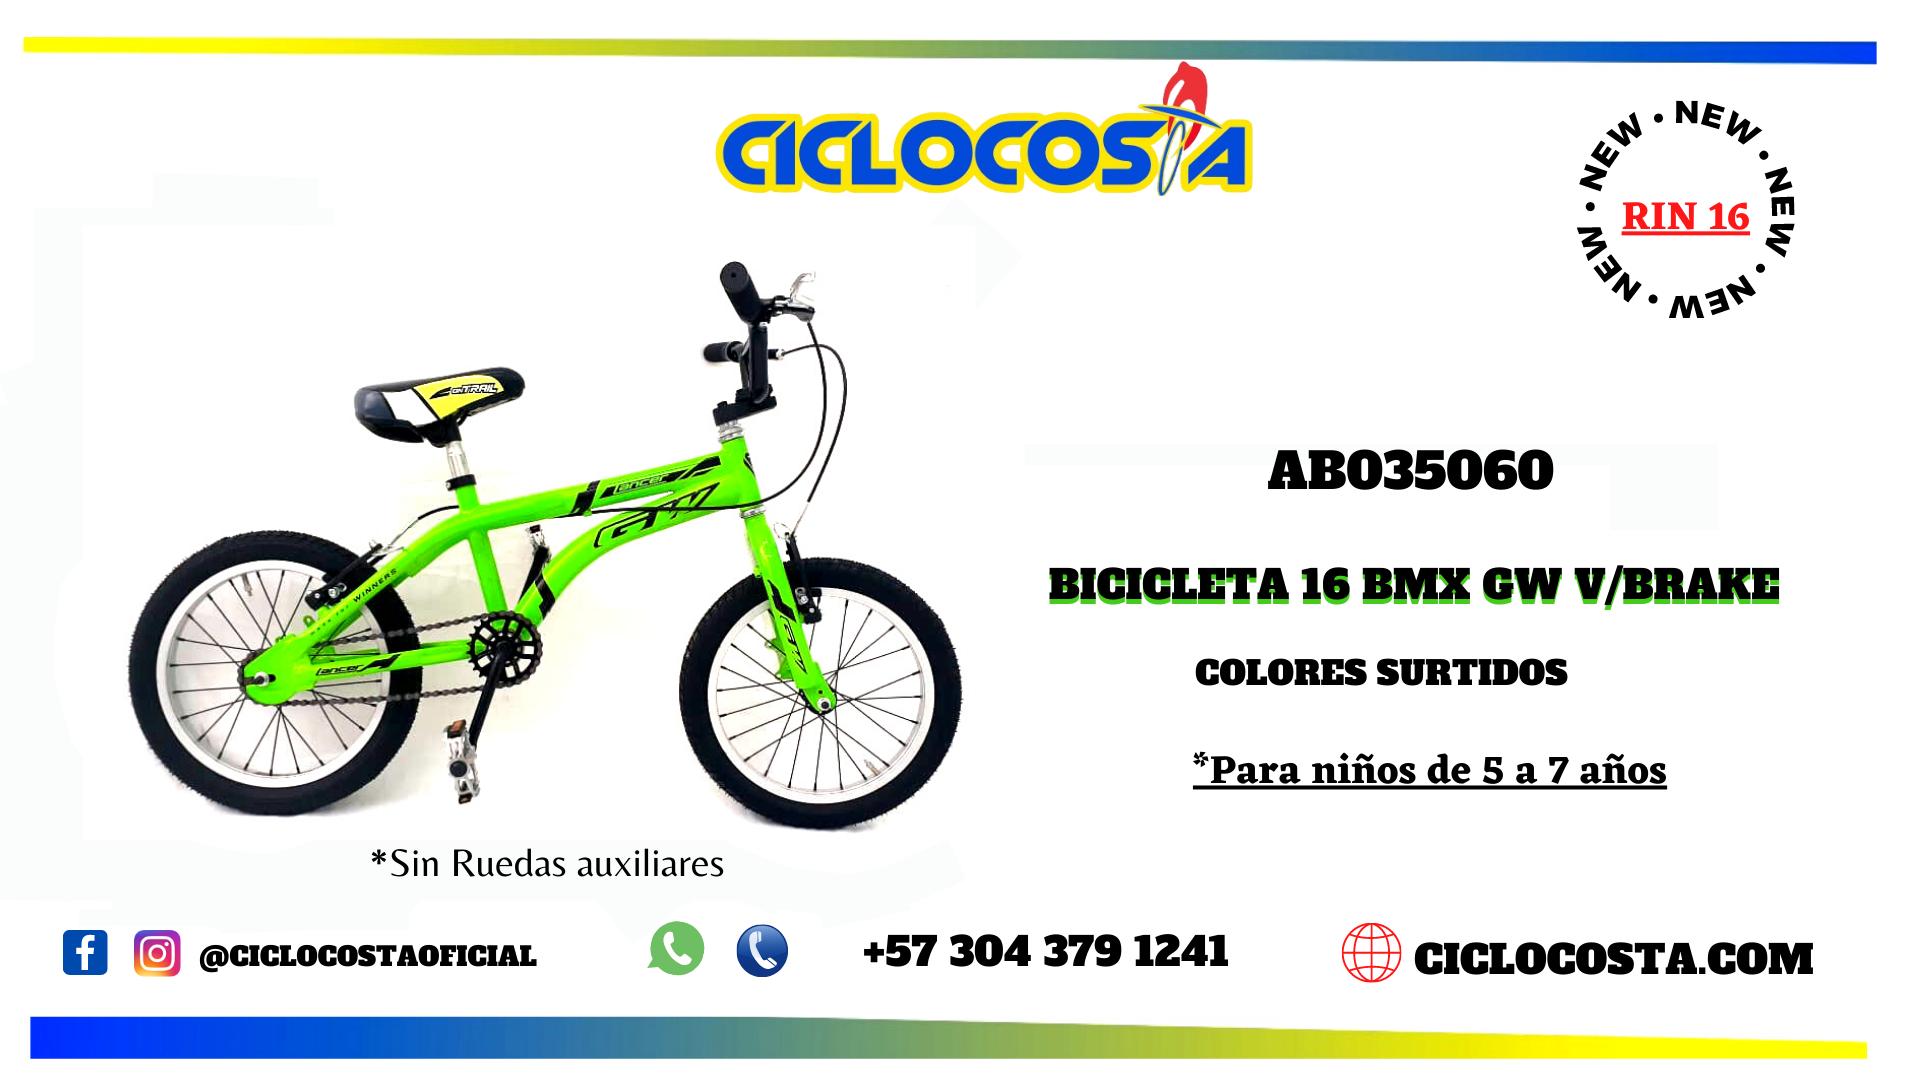 AB035060